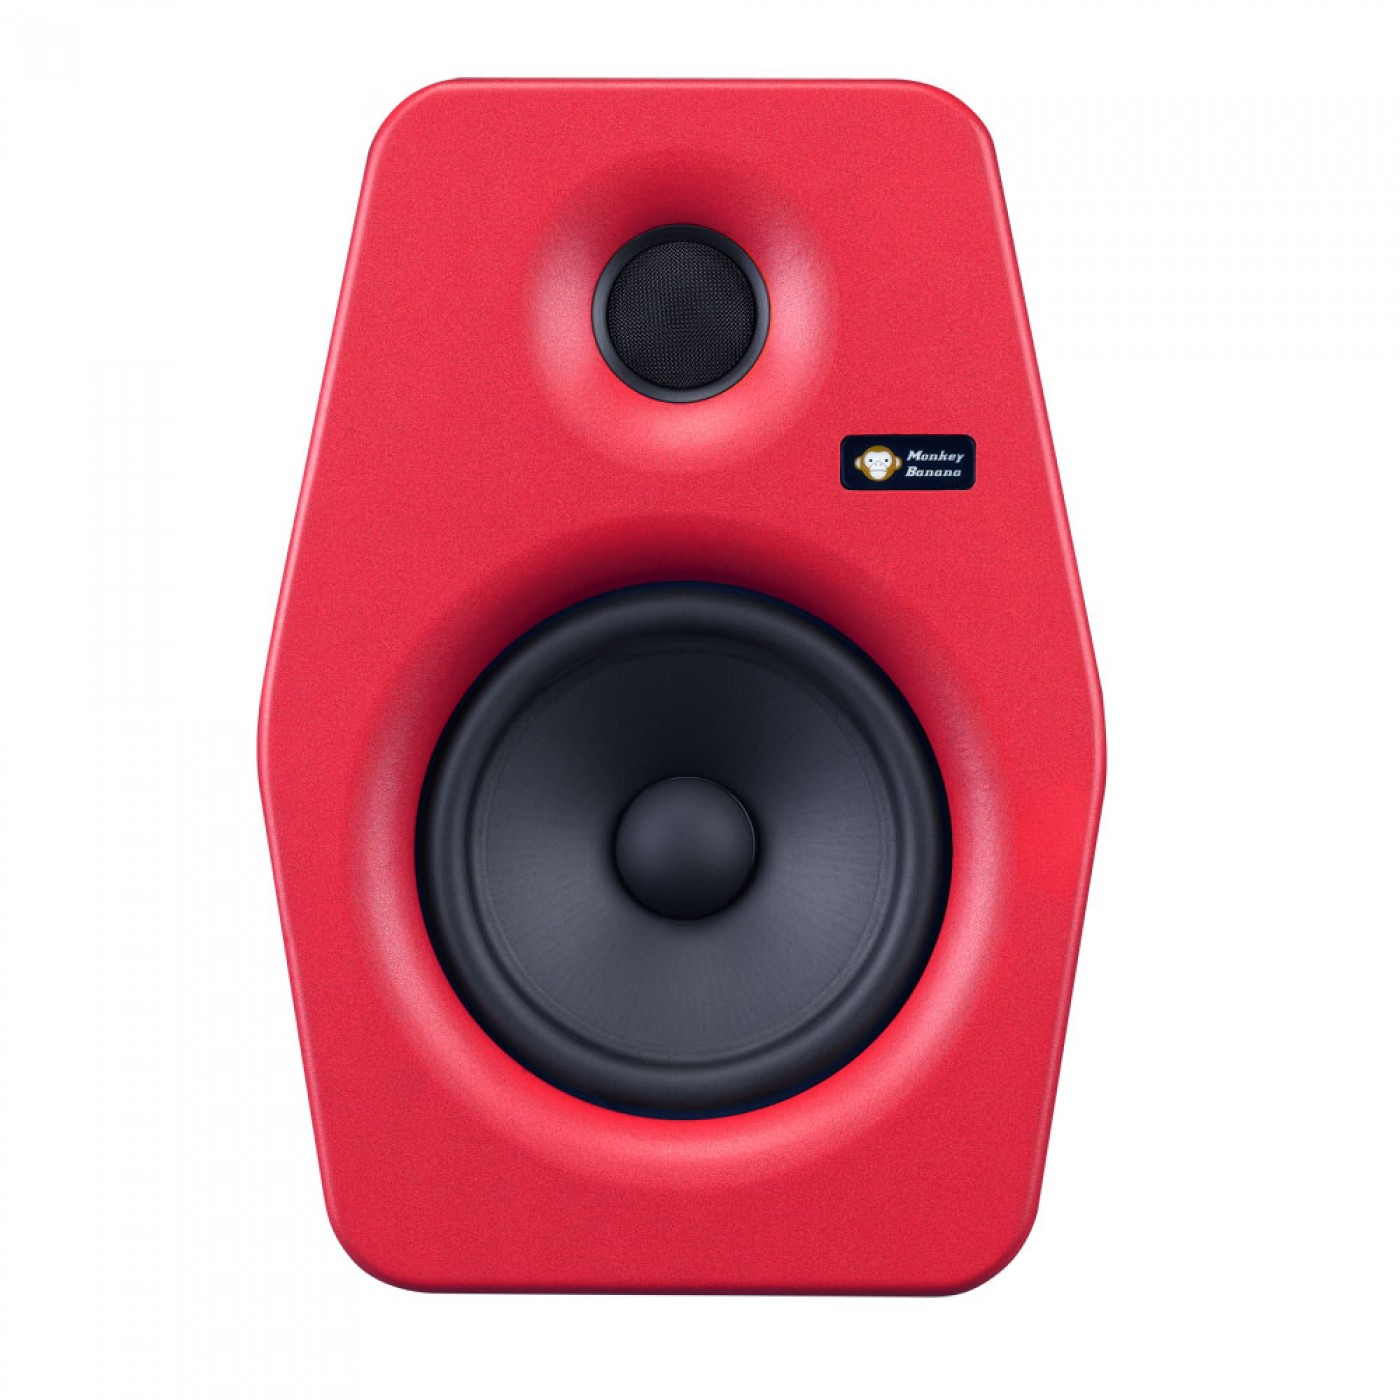 Monkey Banana TURBO 6 Red | Rage Audio